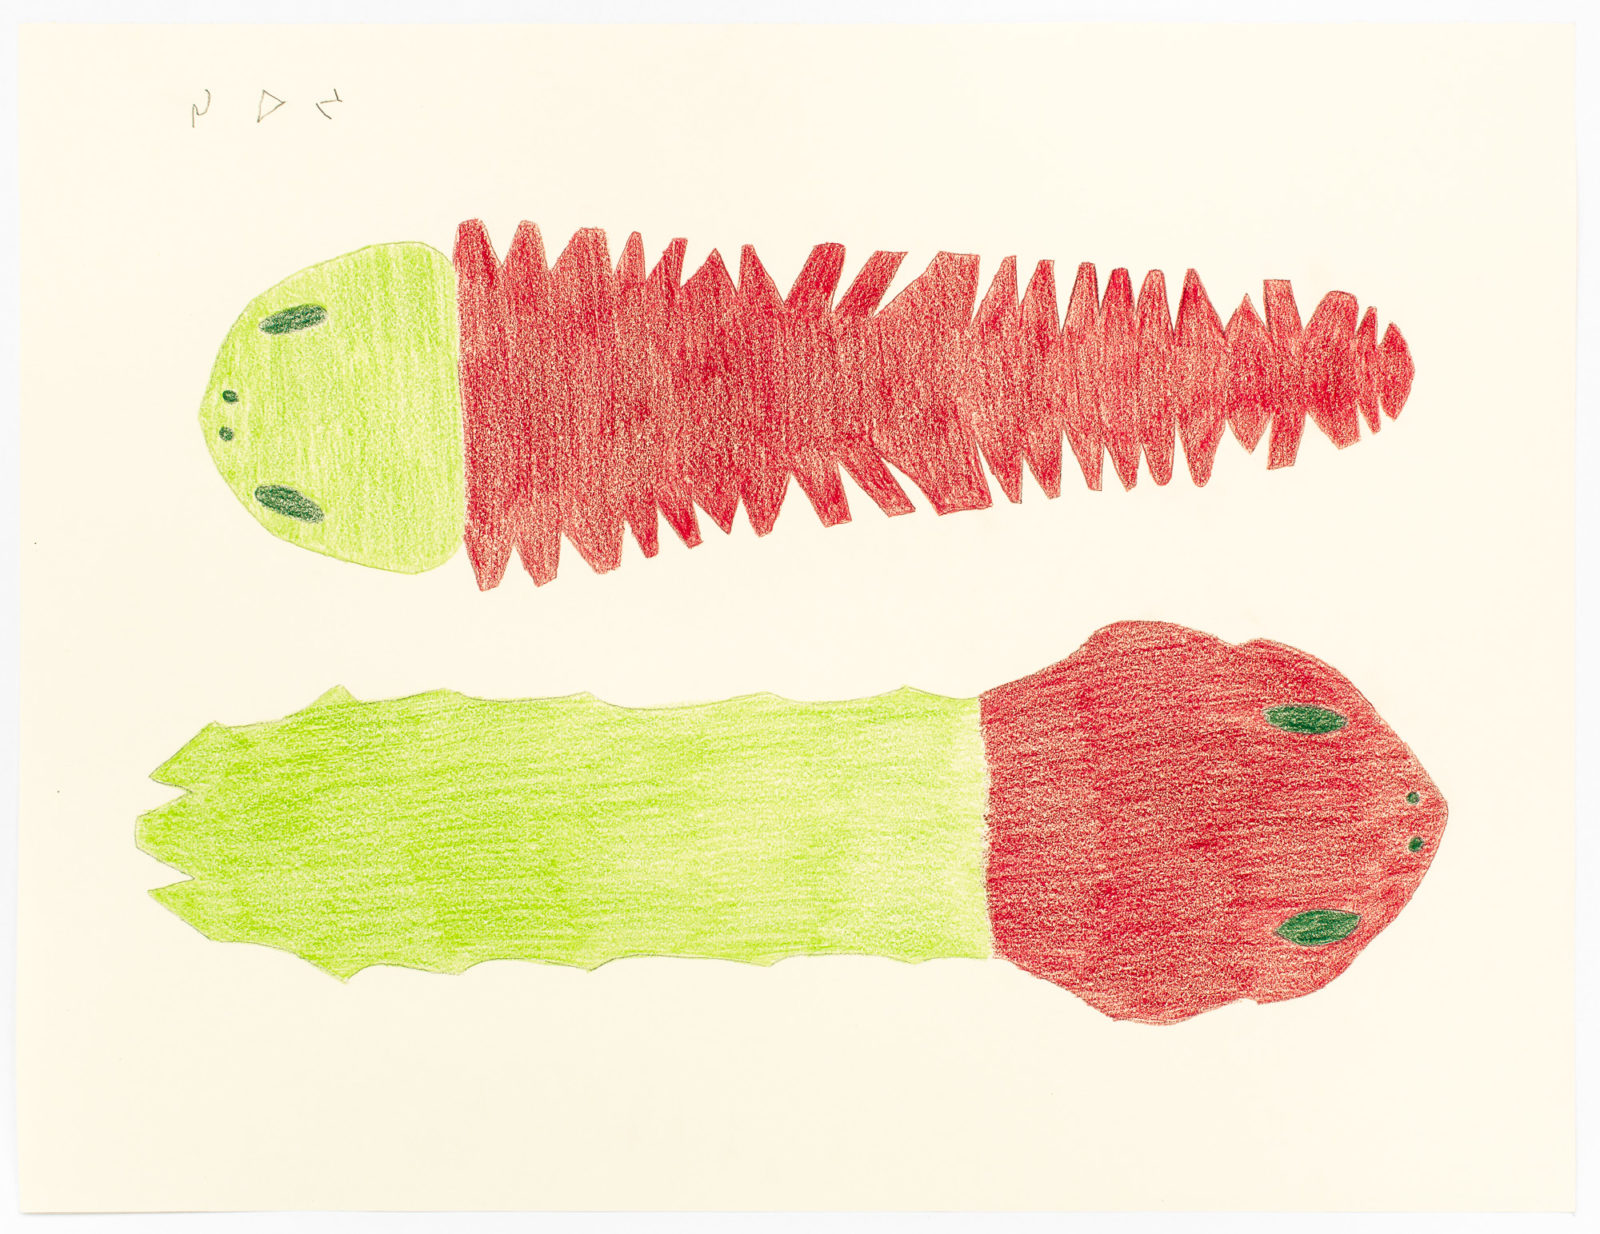 Sheojuk Etidlooie - untitled (sea creatures)